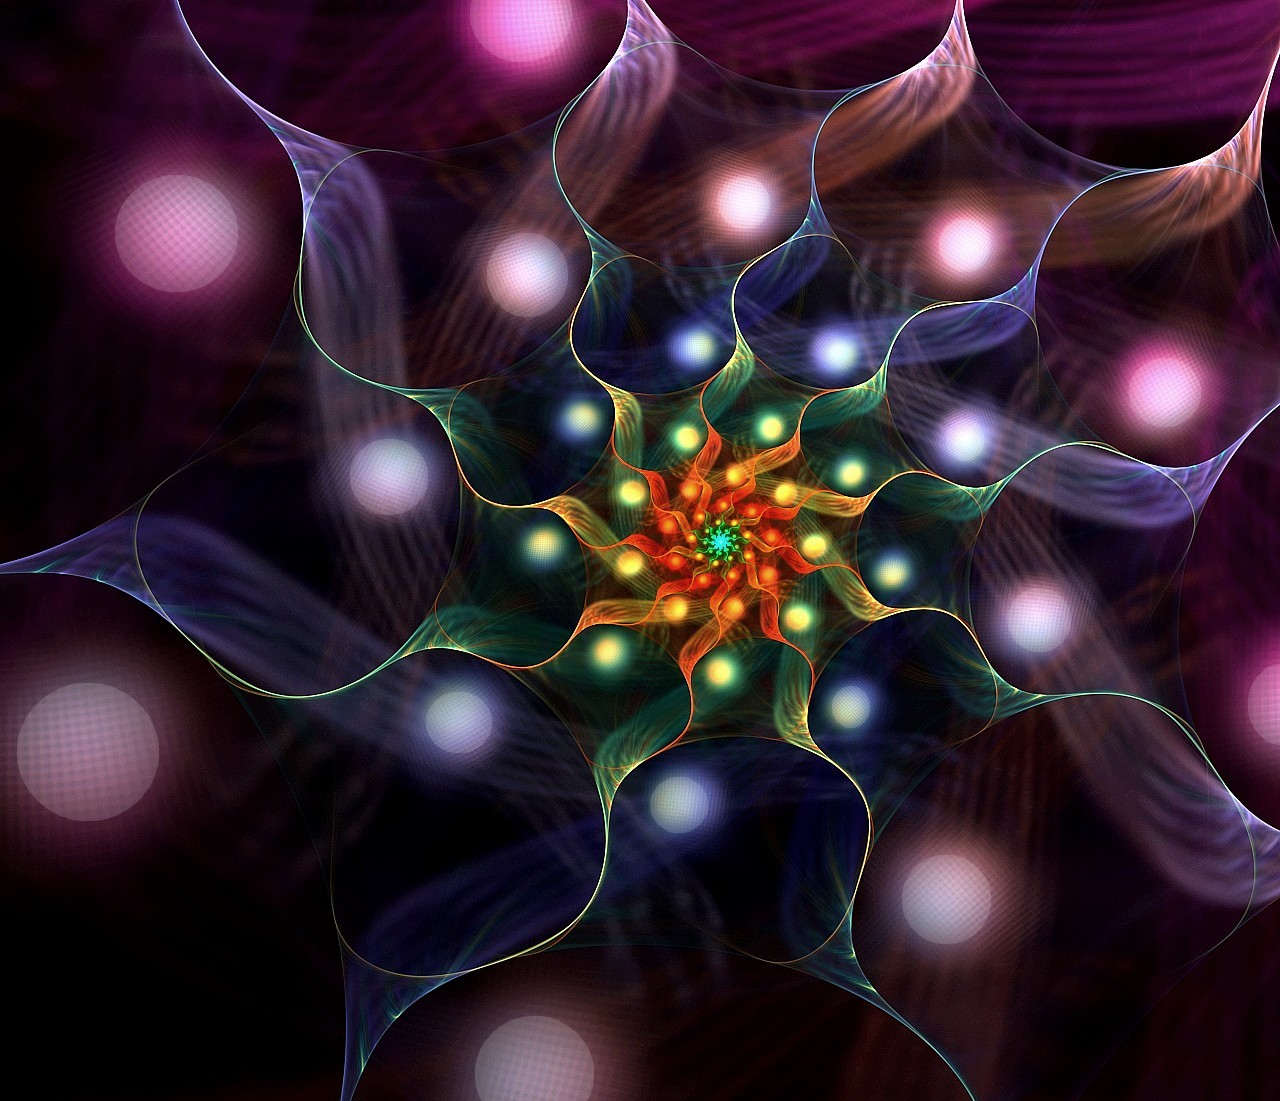 Lampion flower by eReSaW